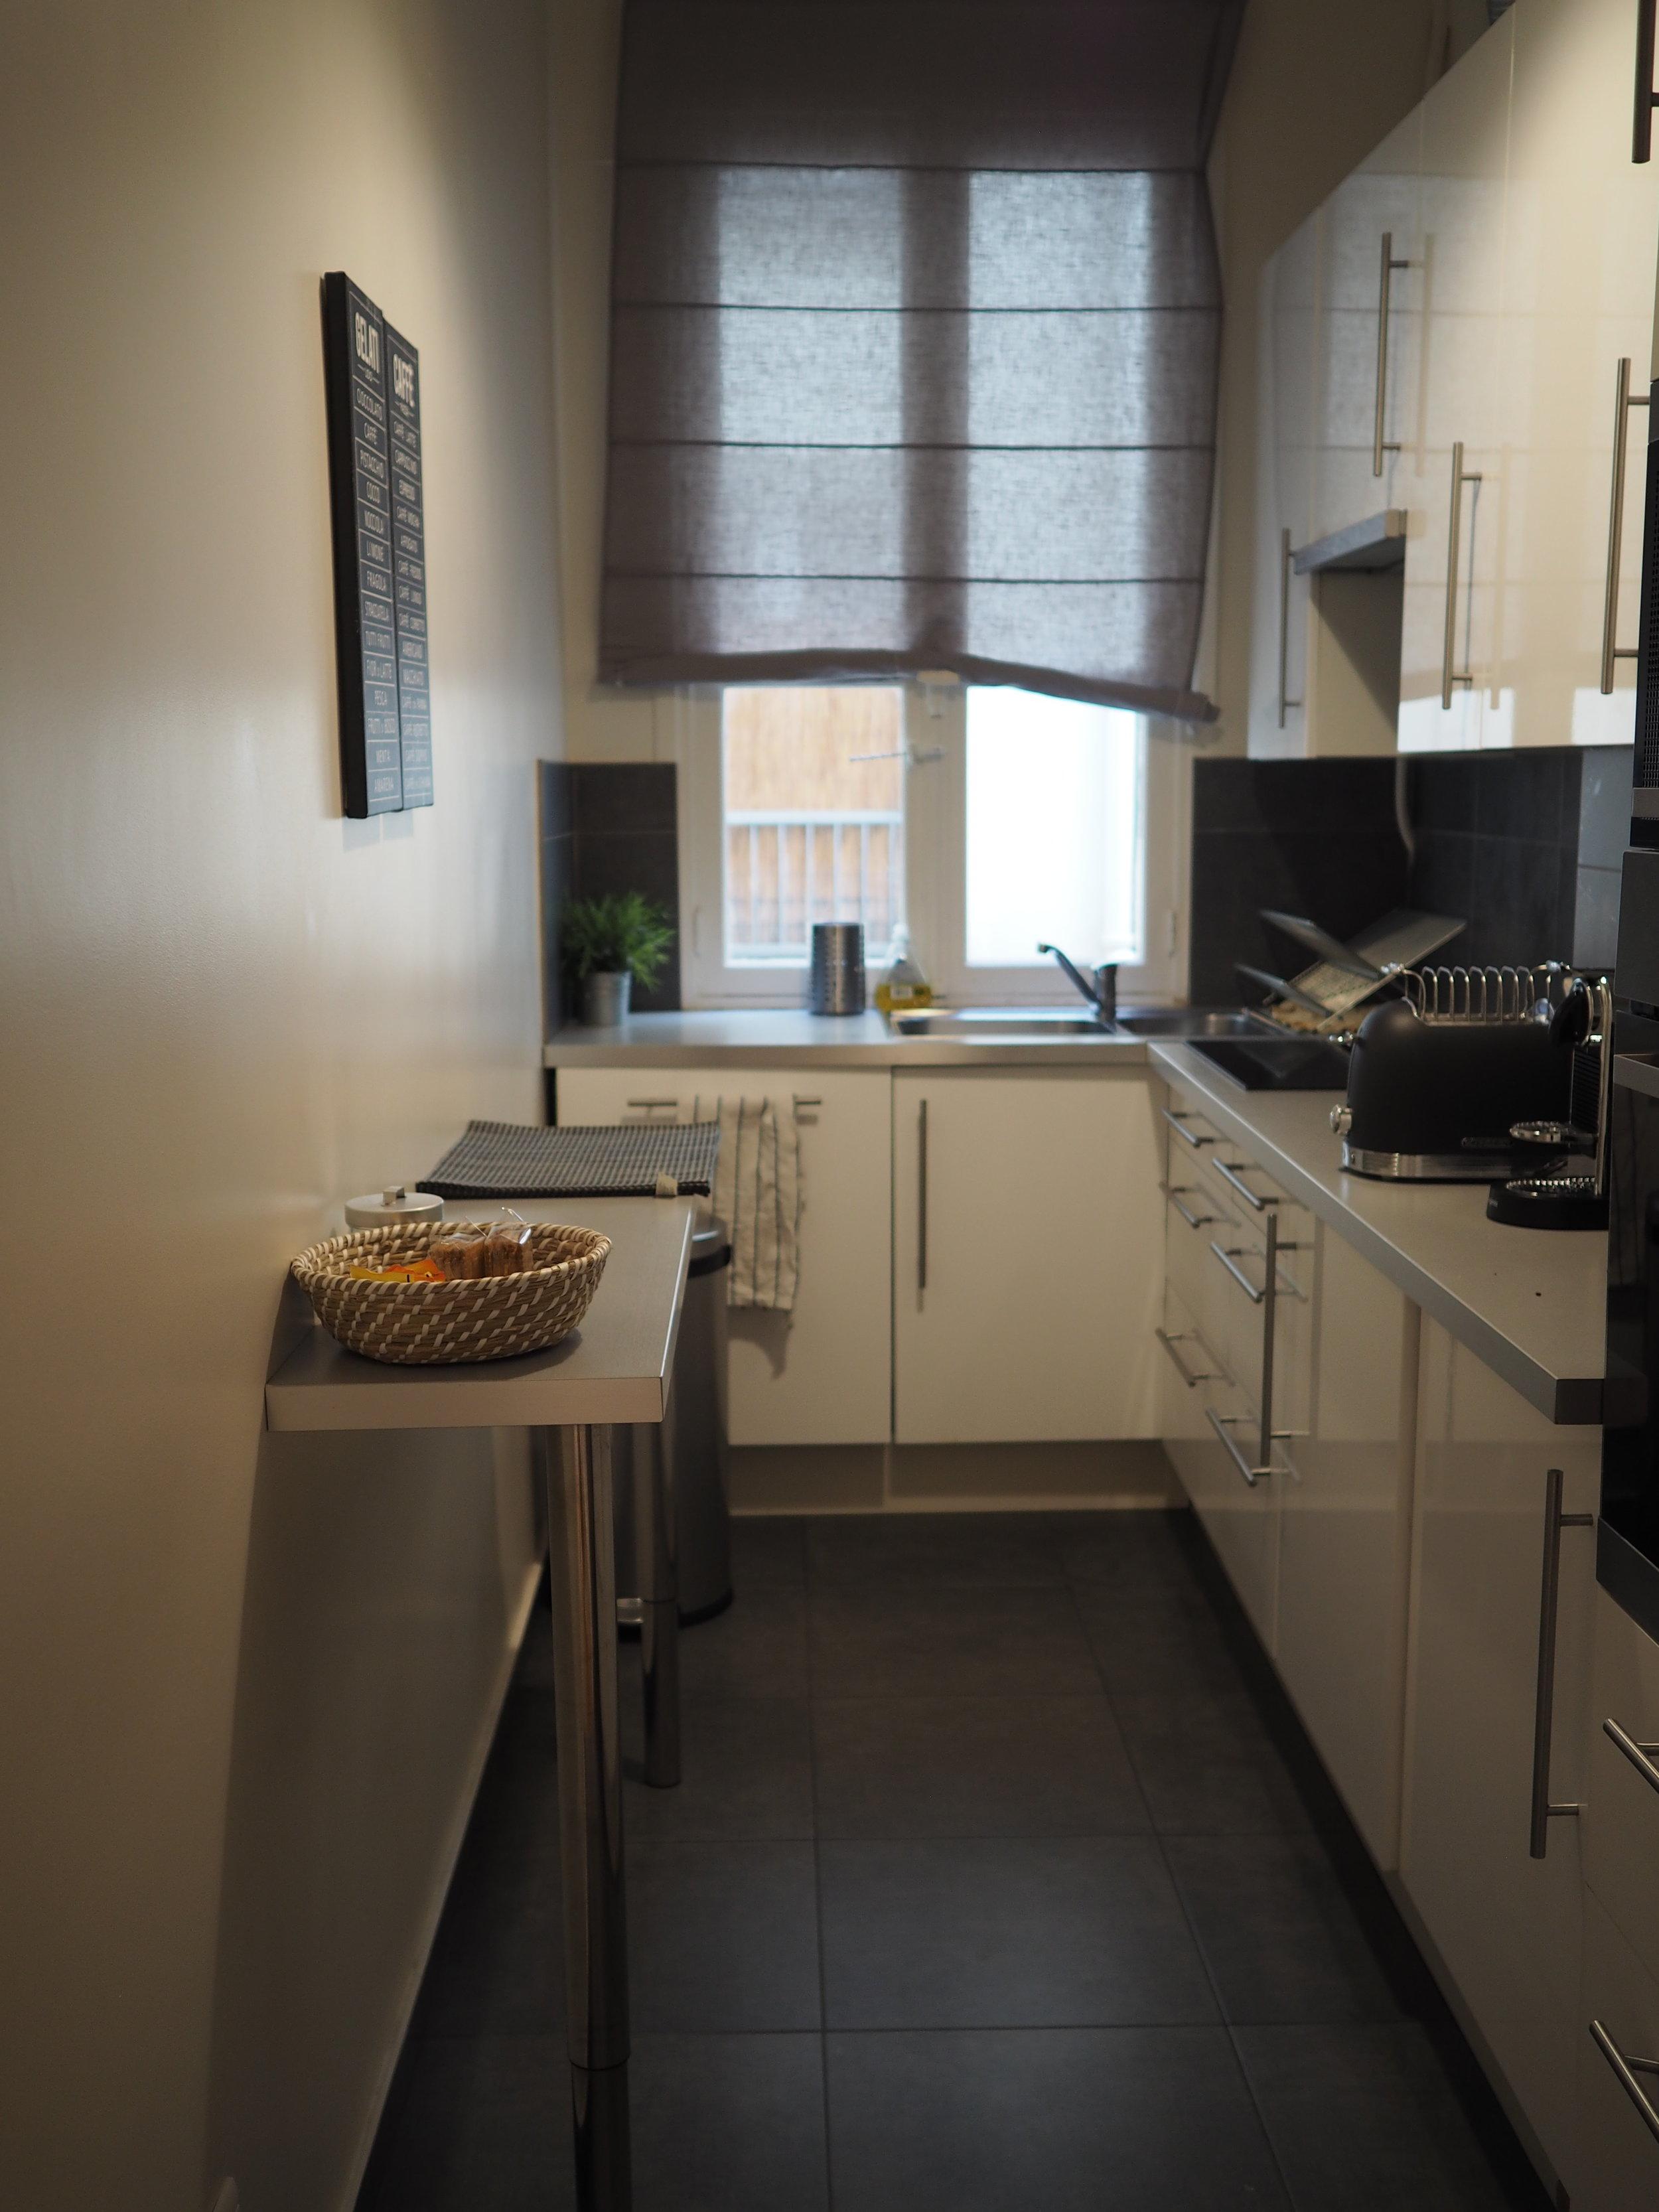 such a cute little kitchen…